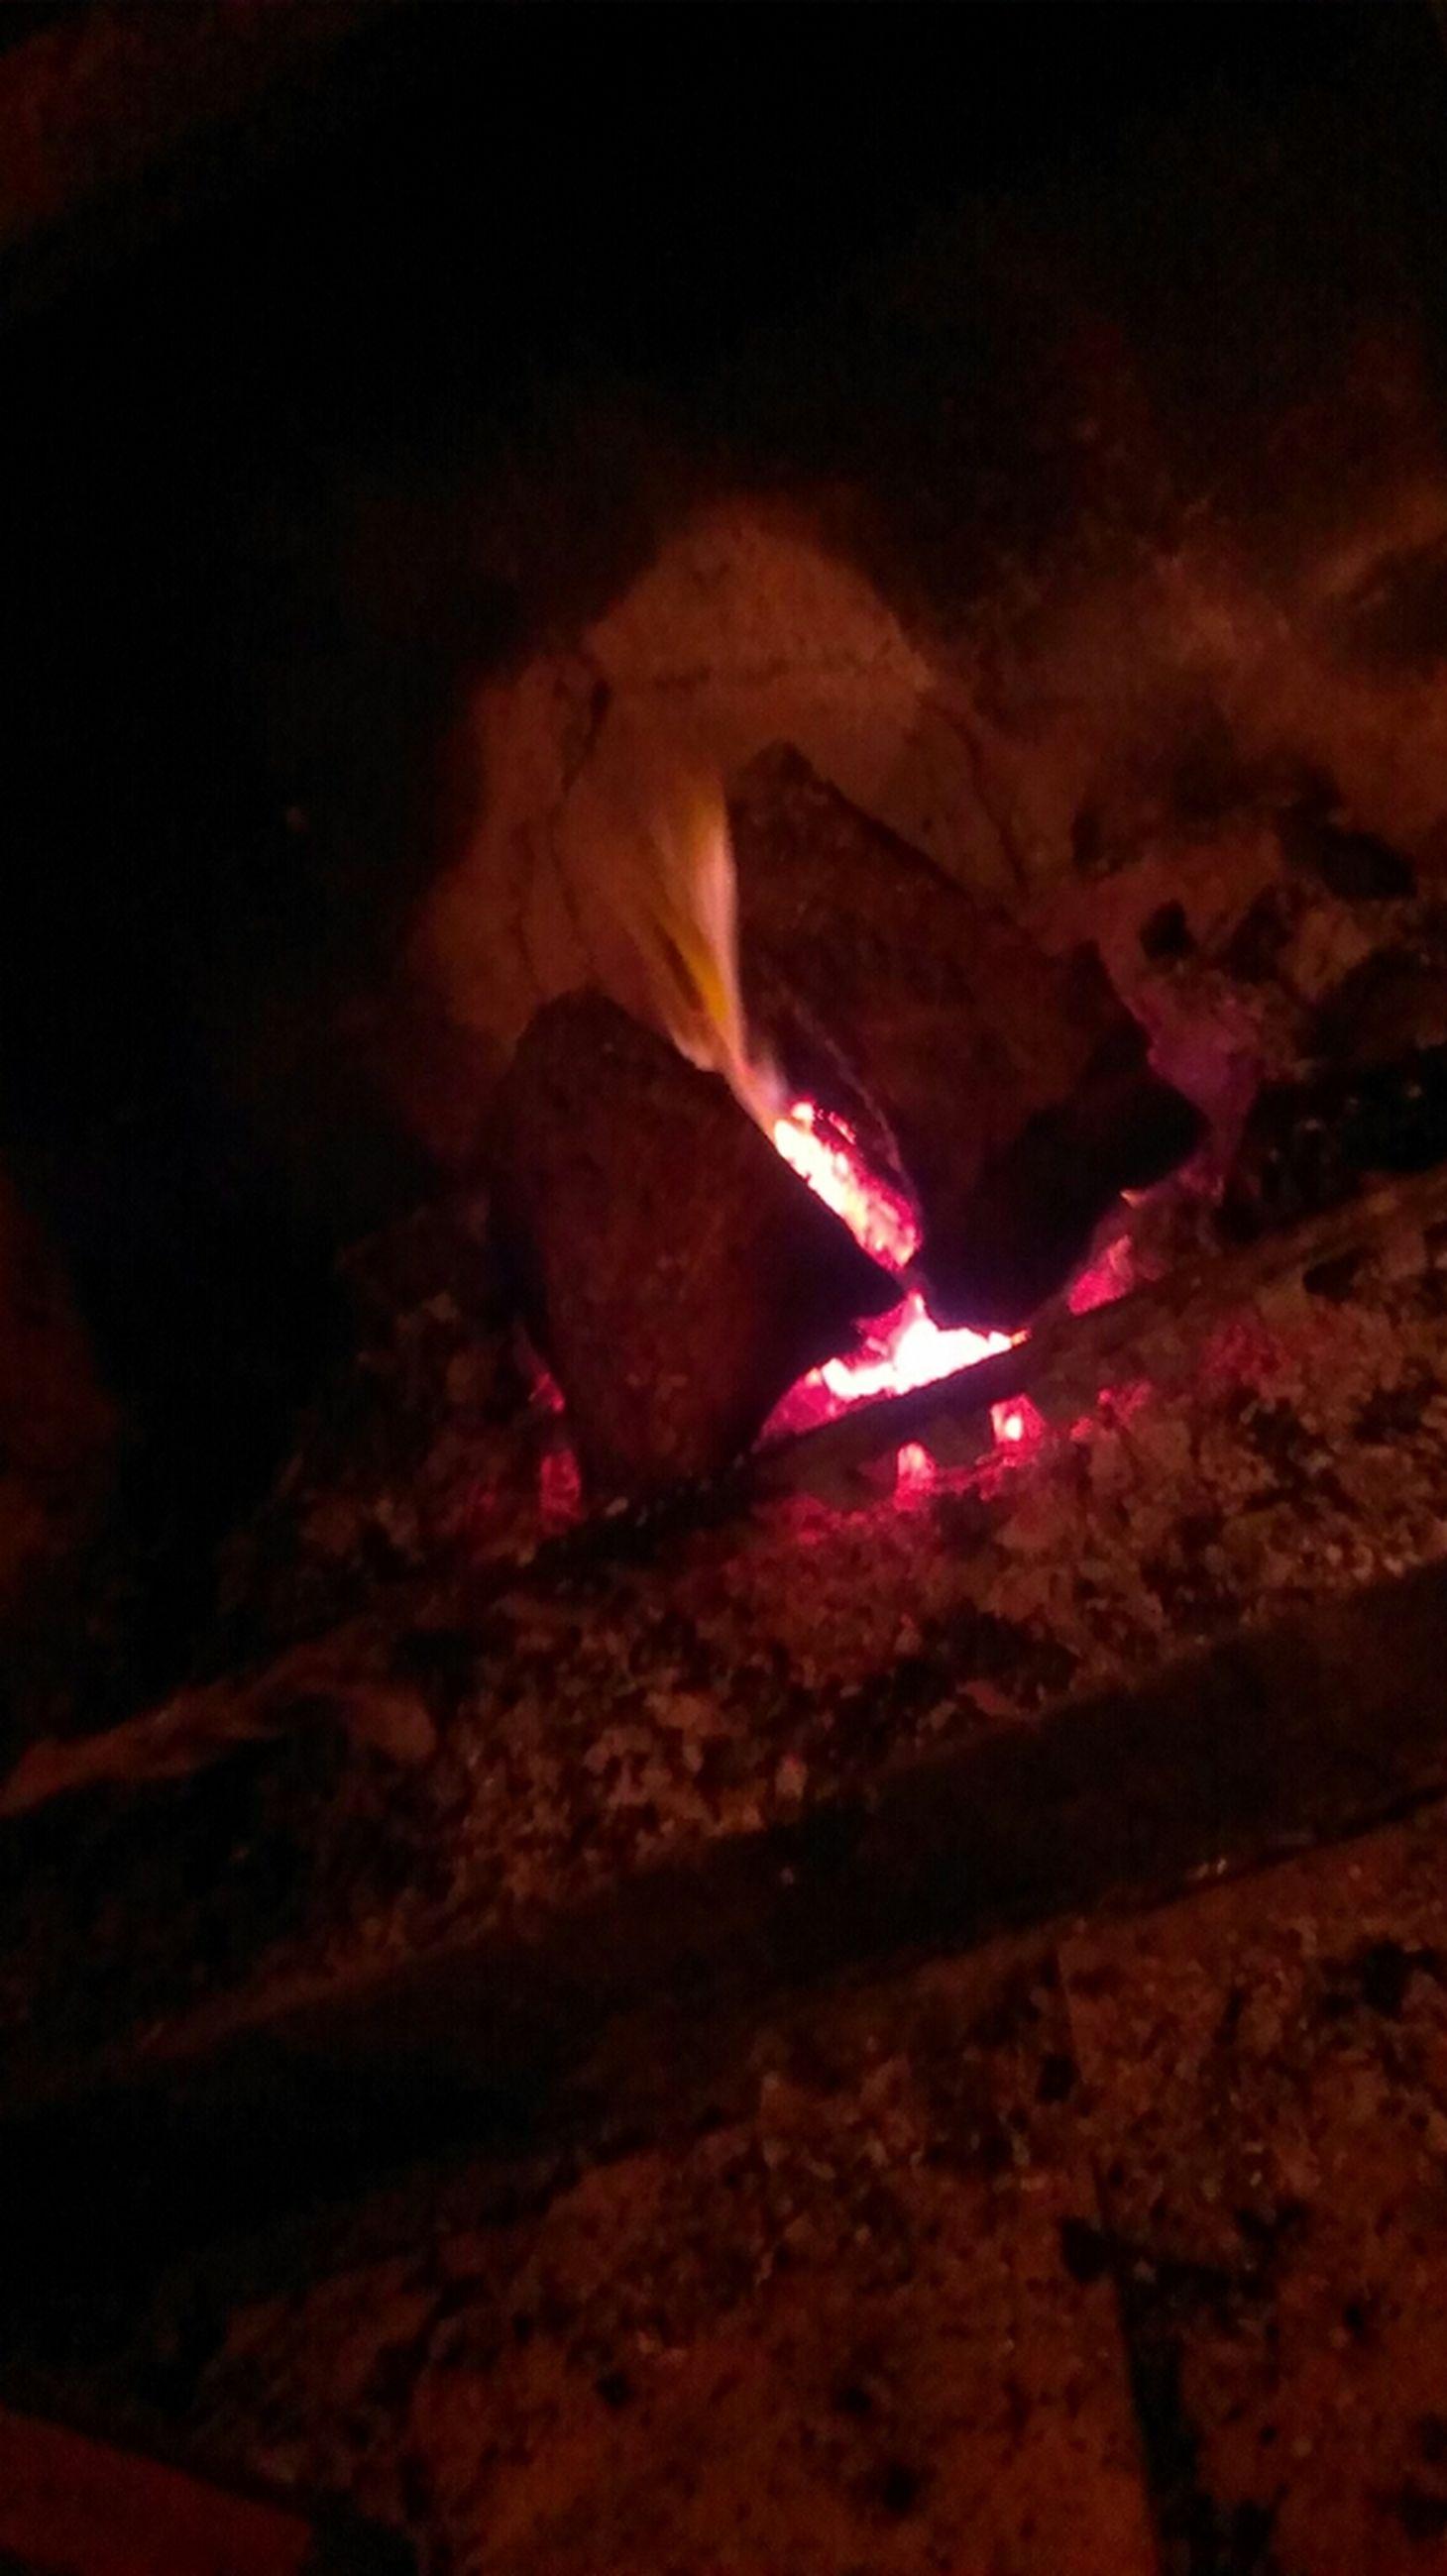 flame, burning, heat - temperature, fire - natural phenomenon, indoors, night, glowing, close-up, fire, dark, illuminated, heat, light - natural phenomenon, bonfire, no people, rock - object, cave, smoke, damaged, candle